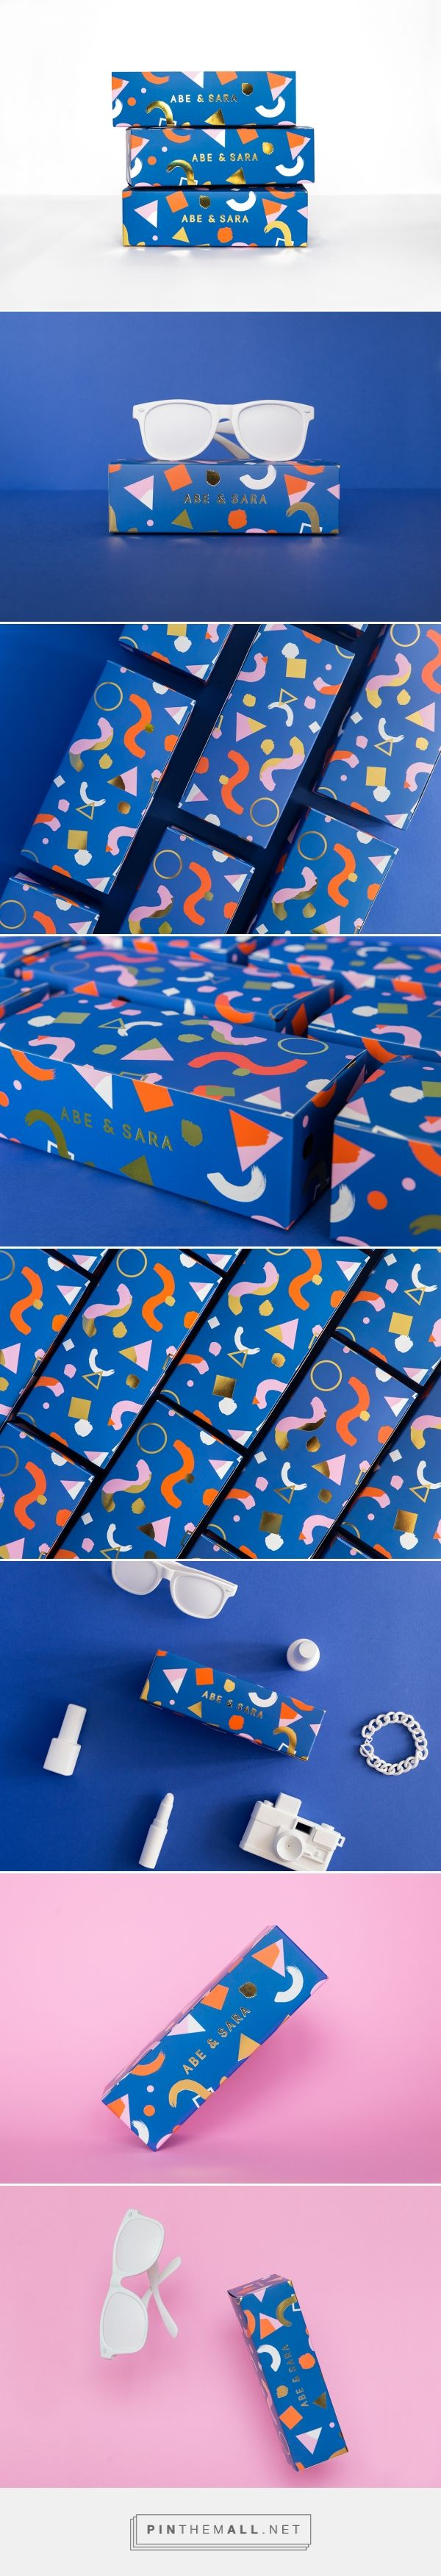 Abe & Sara Sunglass packaging design by Faber & Lo (Australia) - http://www.packagingoftheworld.com/2016/07/abe-sara-sunglass-box.html